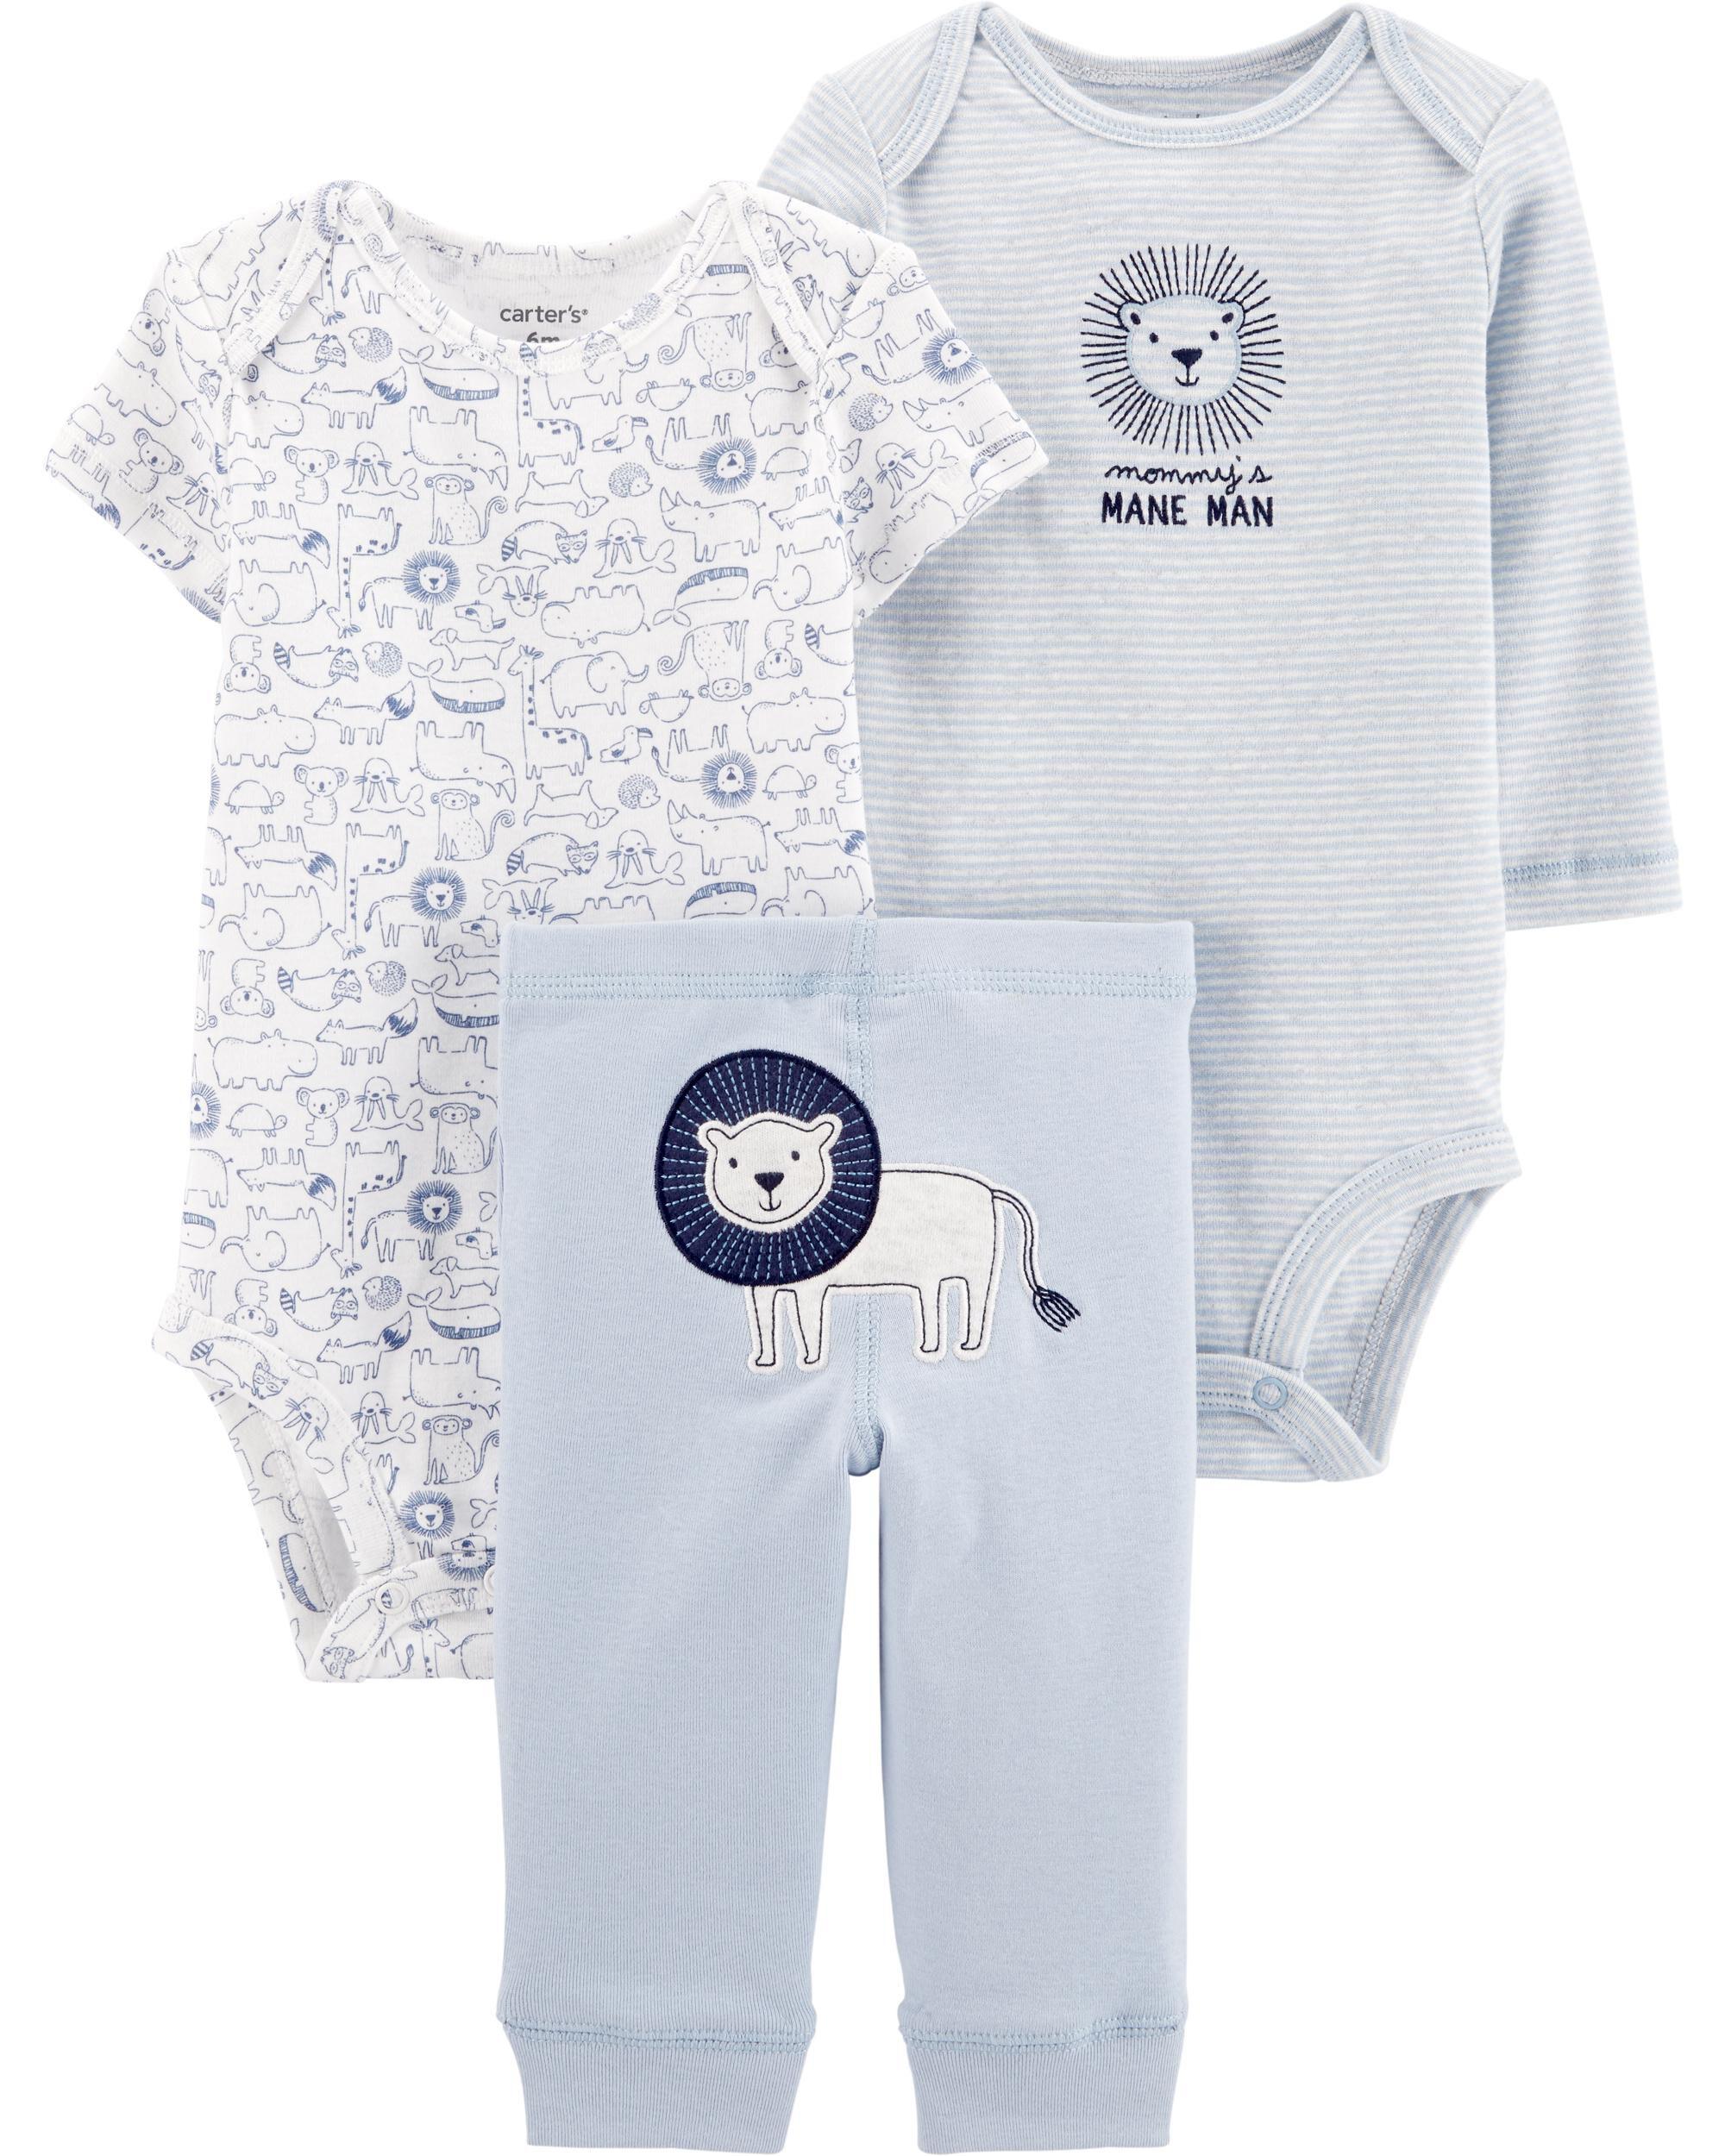 NEW Carter/'s Baby Boys/' 3 Piece Paw Print Little Jacket Set Various Sizes